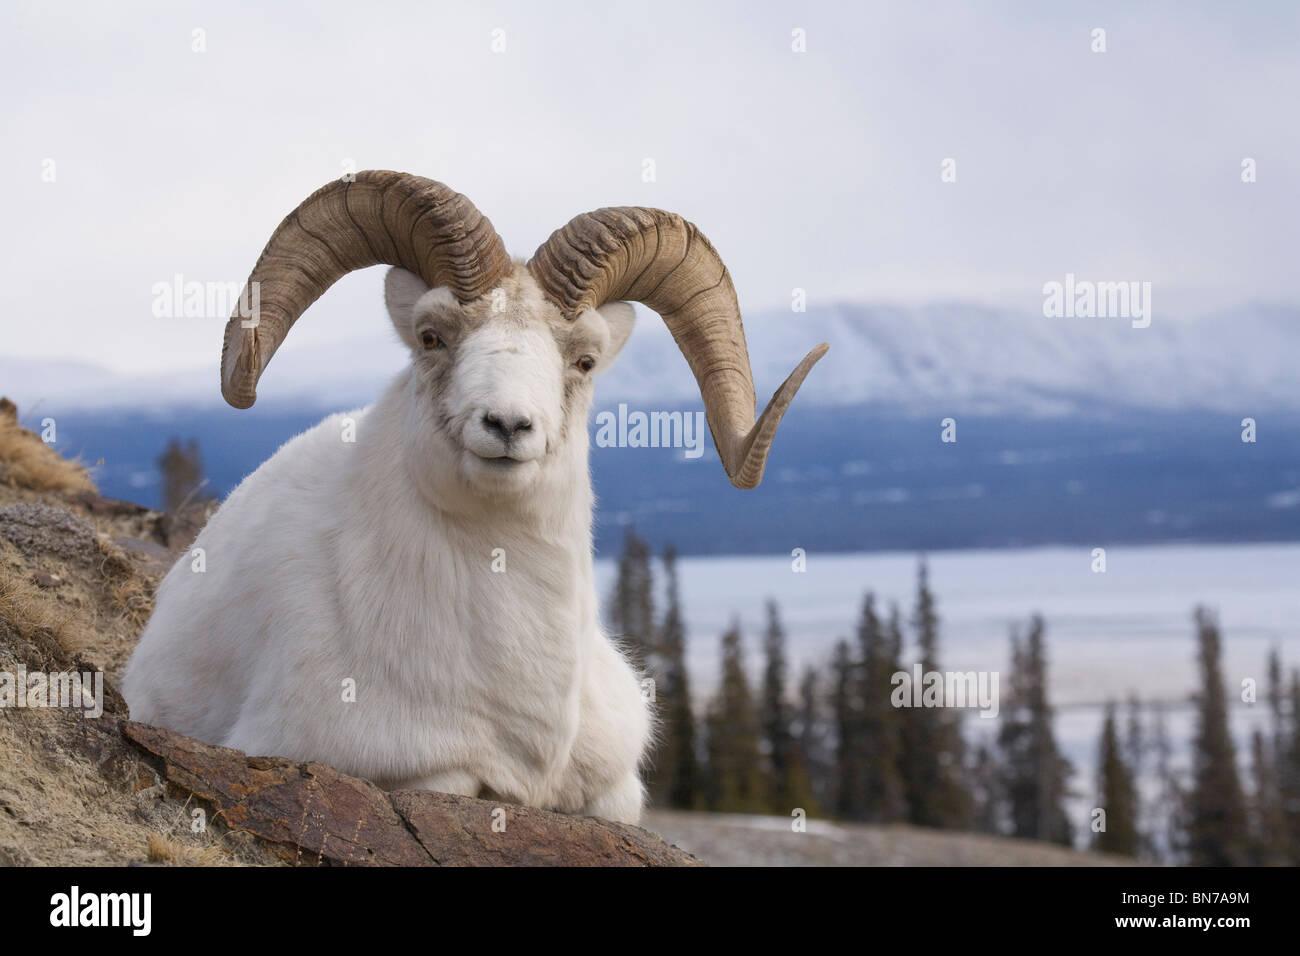 Dall Sheep ram bedded down on Sheep Mountain overlooking Kluane Lake in Kluane National Park, Yukon Territory, Canada - Stock Image